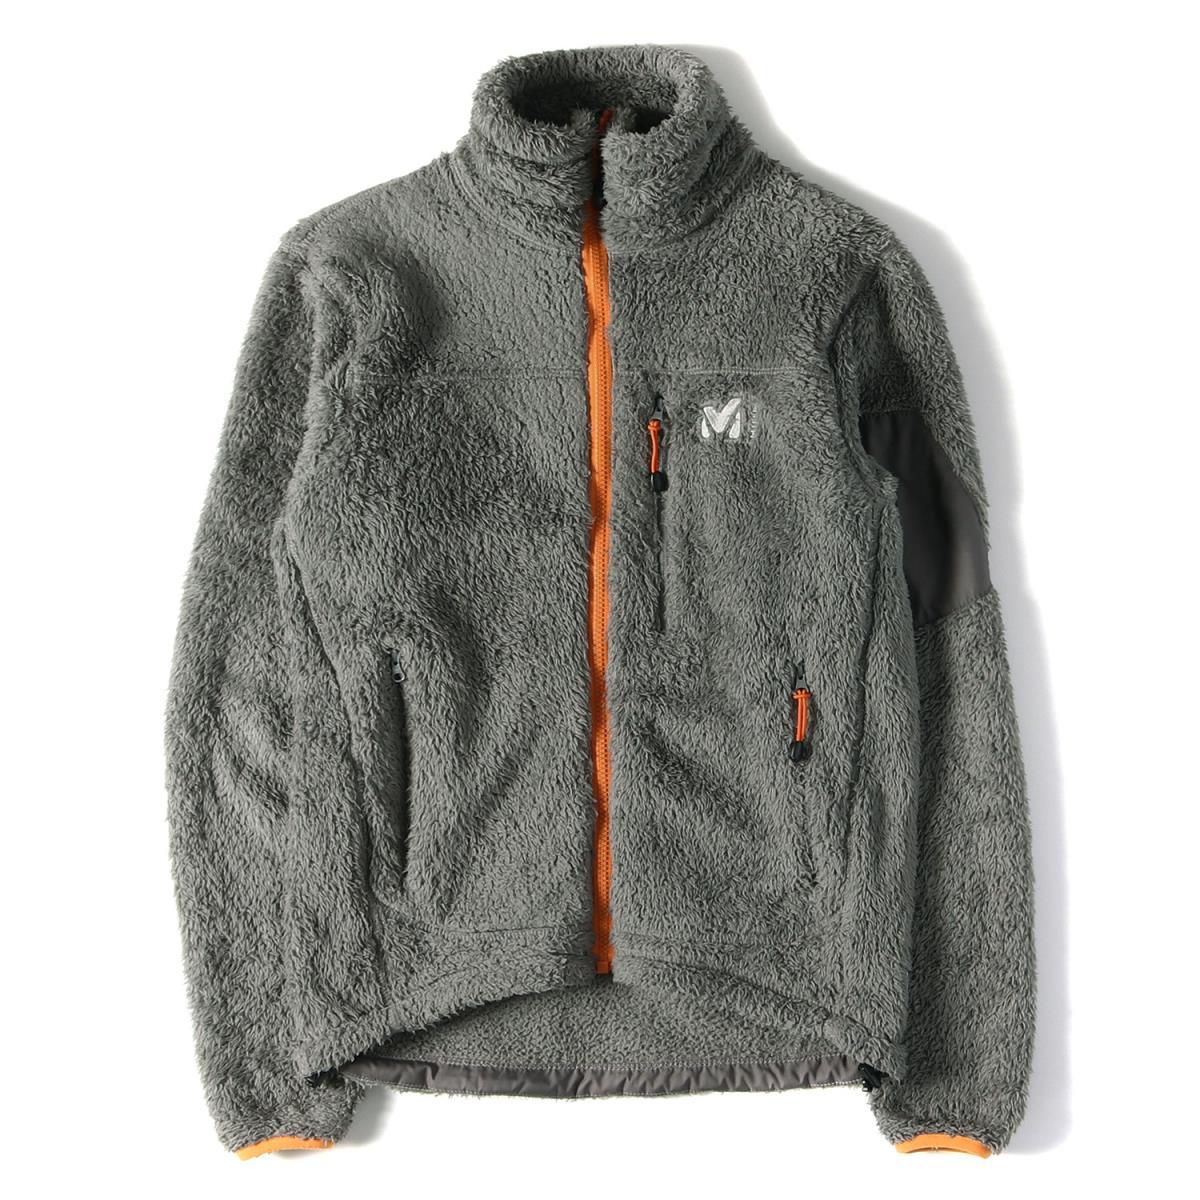 huge selection of 9562a 96a55 MILLET (Millet) ポーラベアーフリースジャケット (POLAR BEAR FLEECE JKT) gray XS